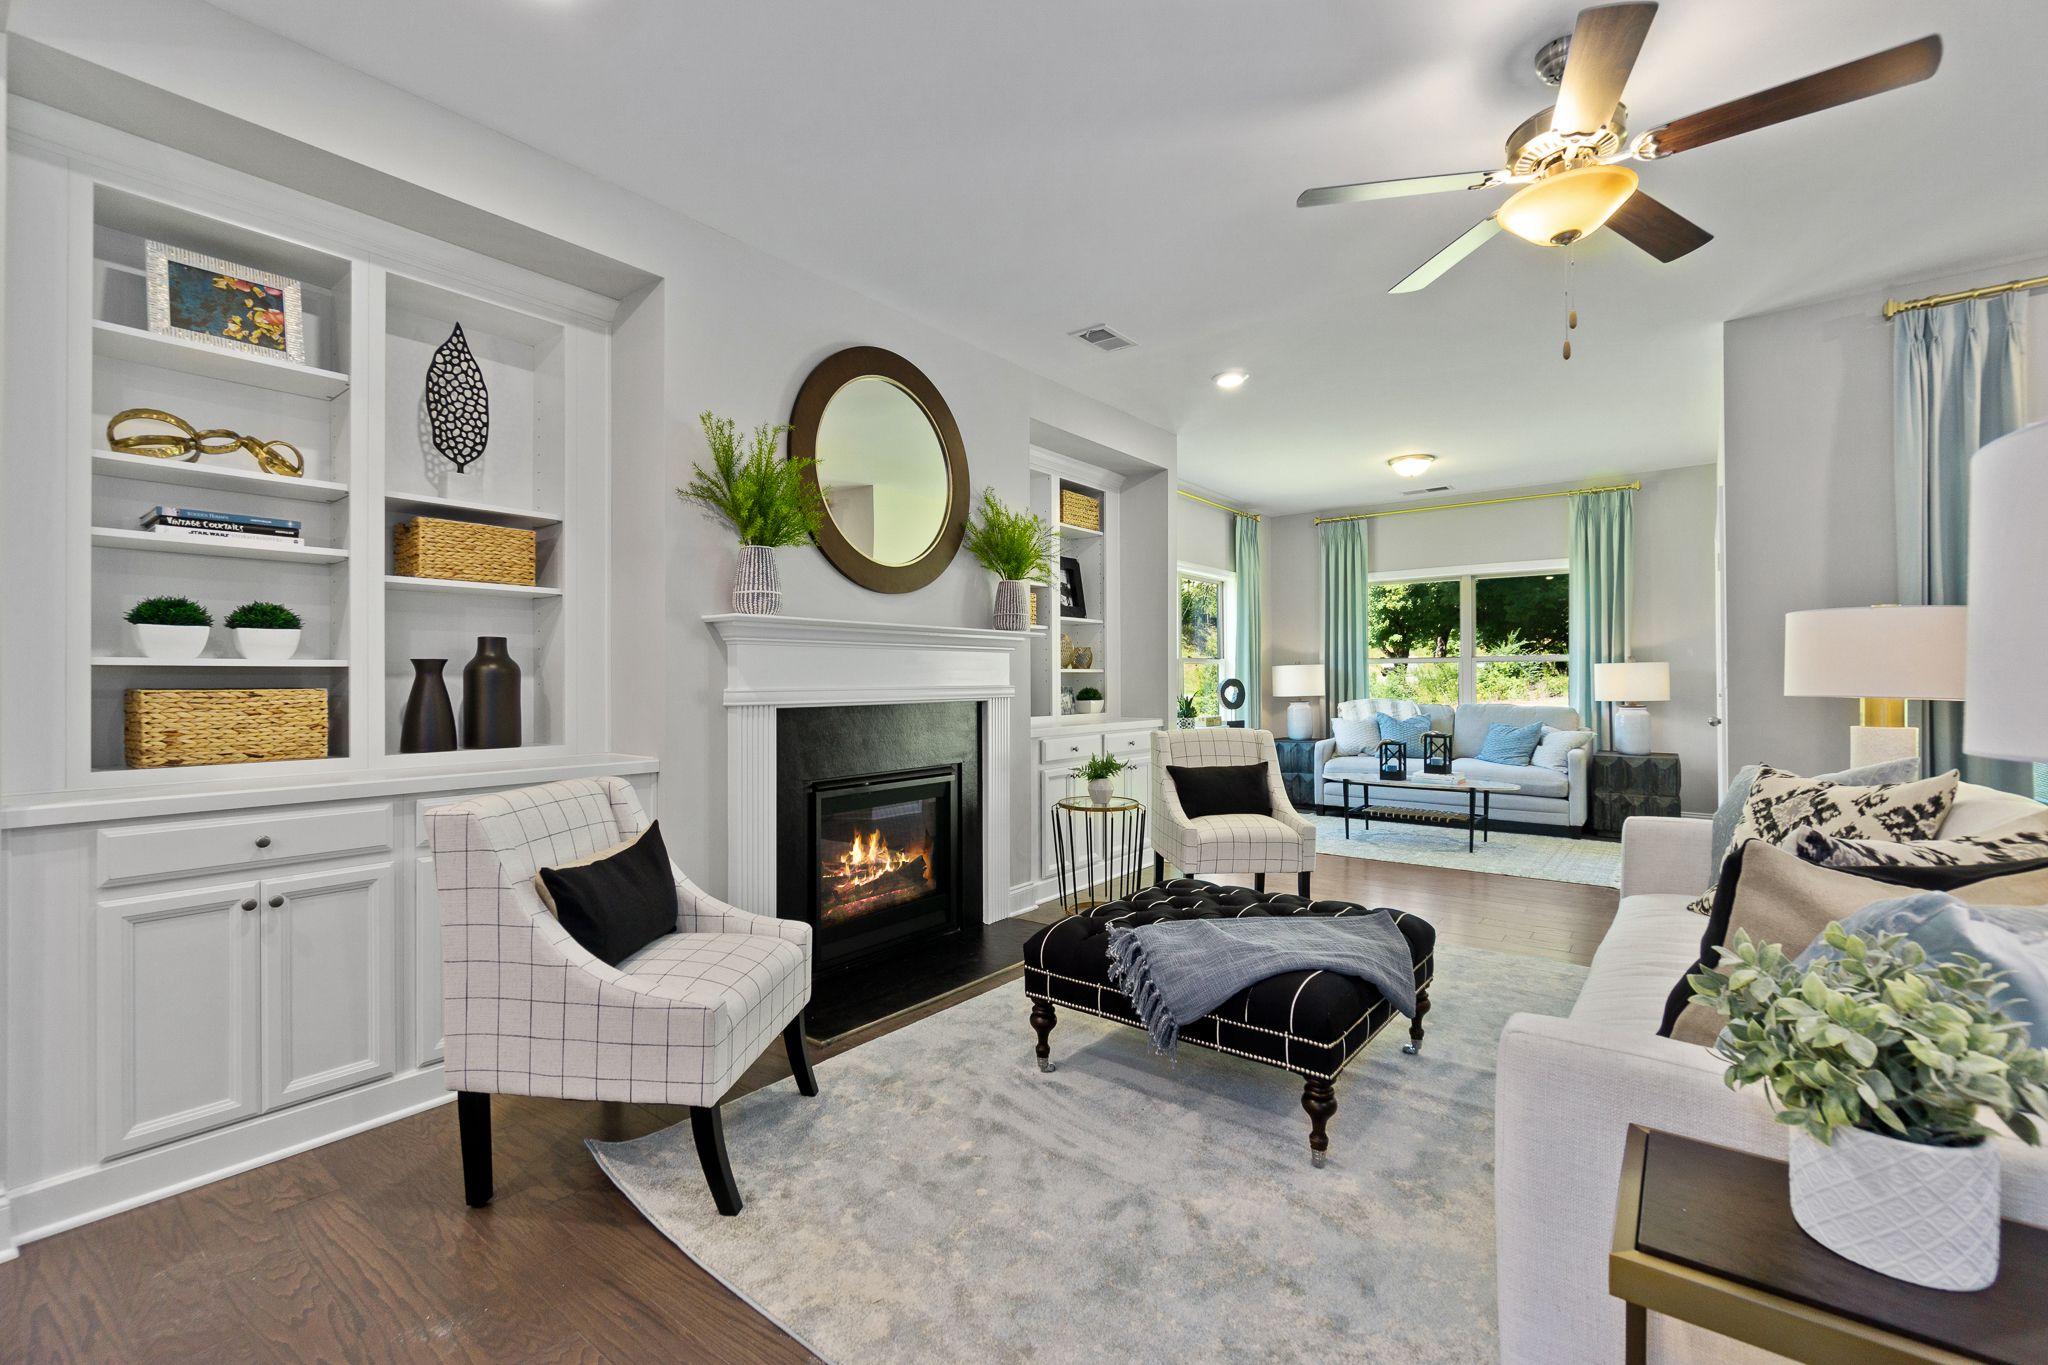 Photo of Fireplace